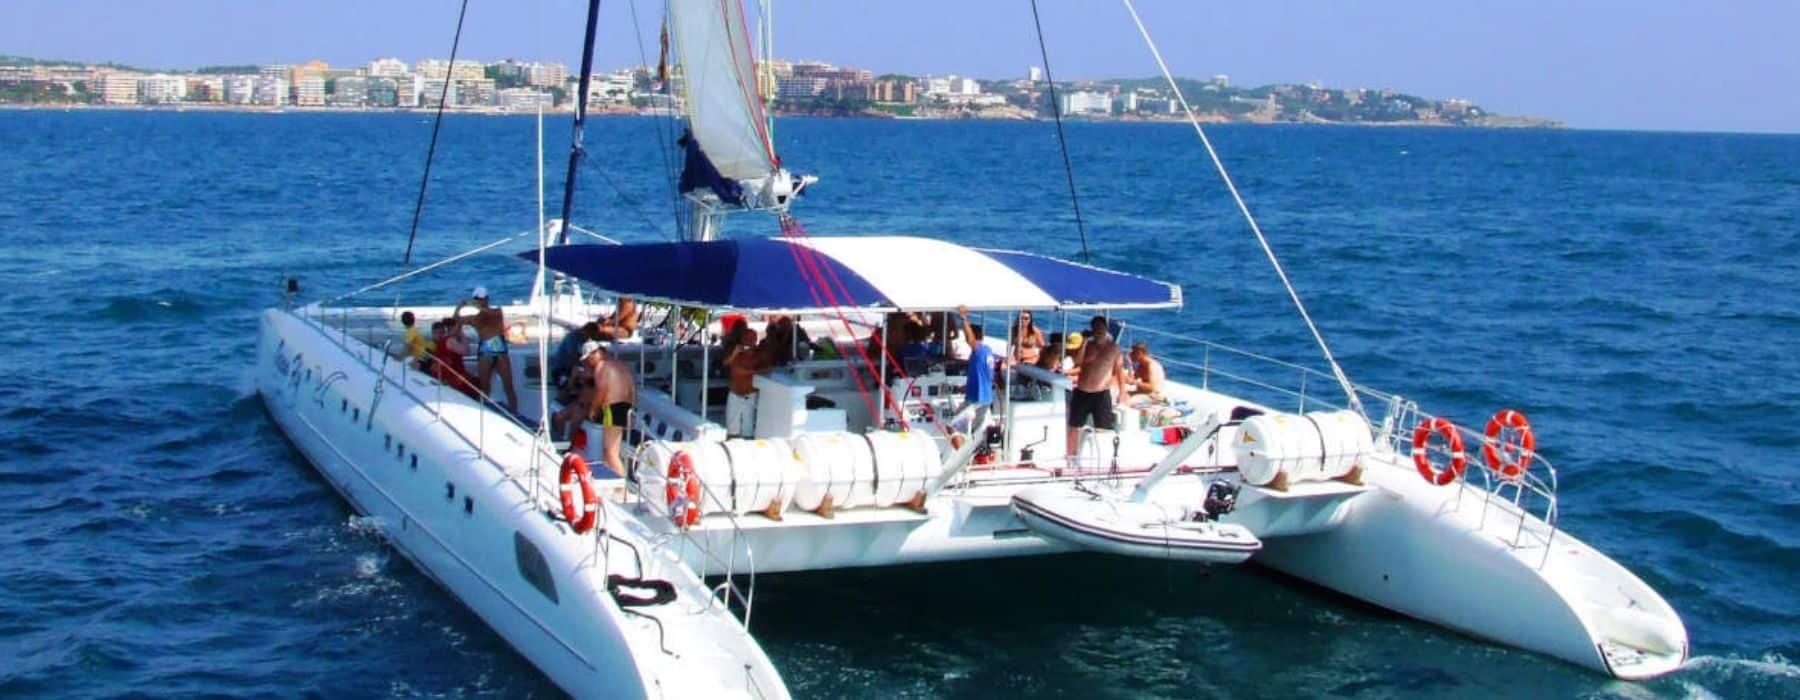 TEAM BUILDING mer catamaran voilier